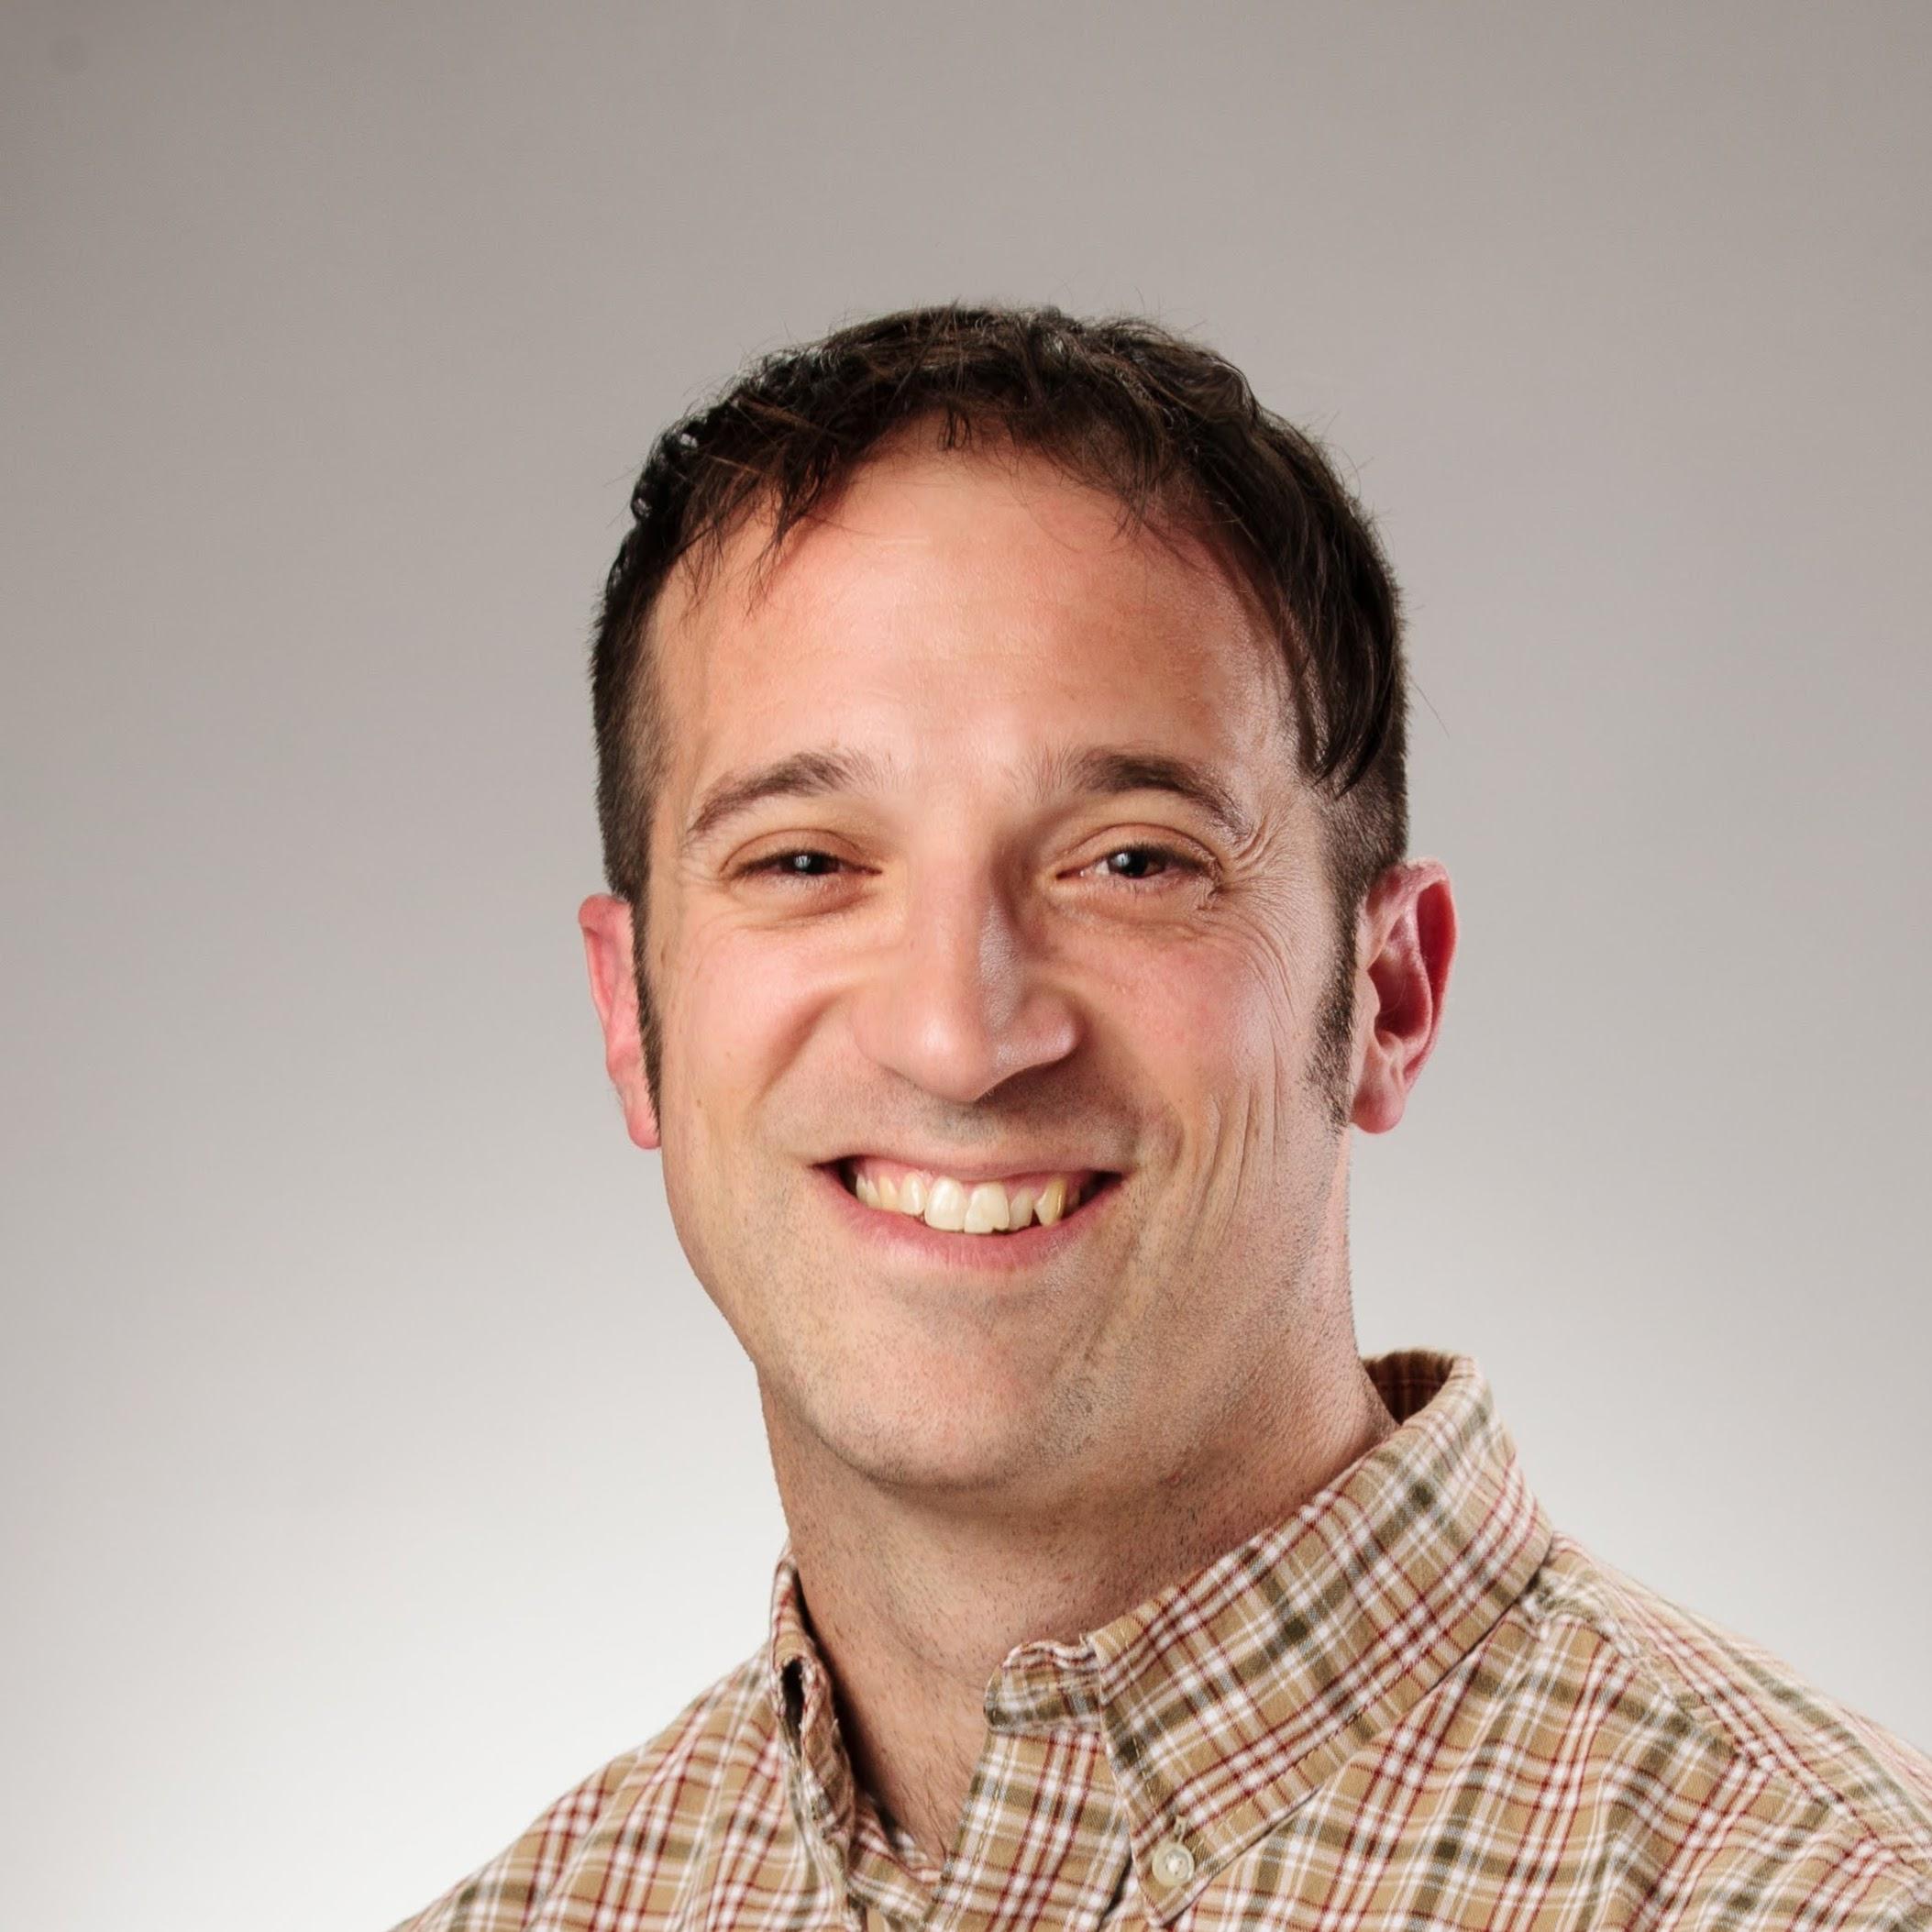 Adam Messano